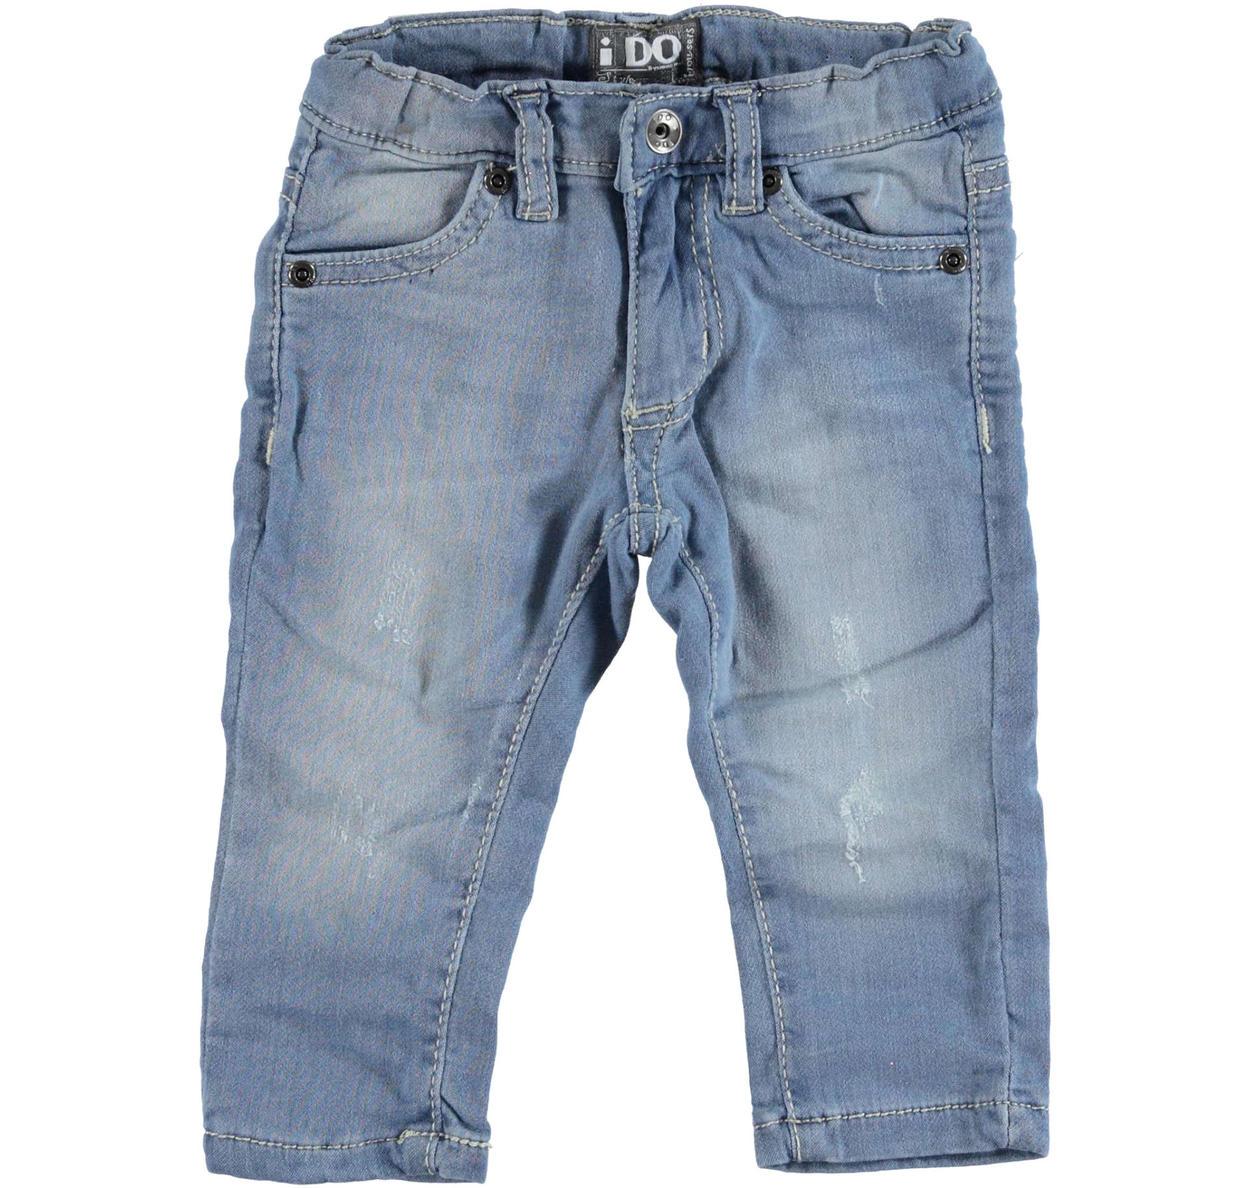 73c04615c7adfa Pantalone slim fit in felpa effetto denim per bambino da 6 mesi a 7 anni iDO